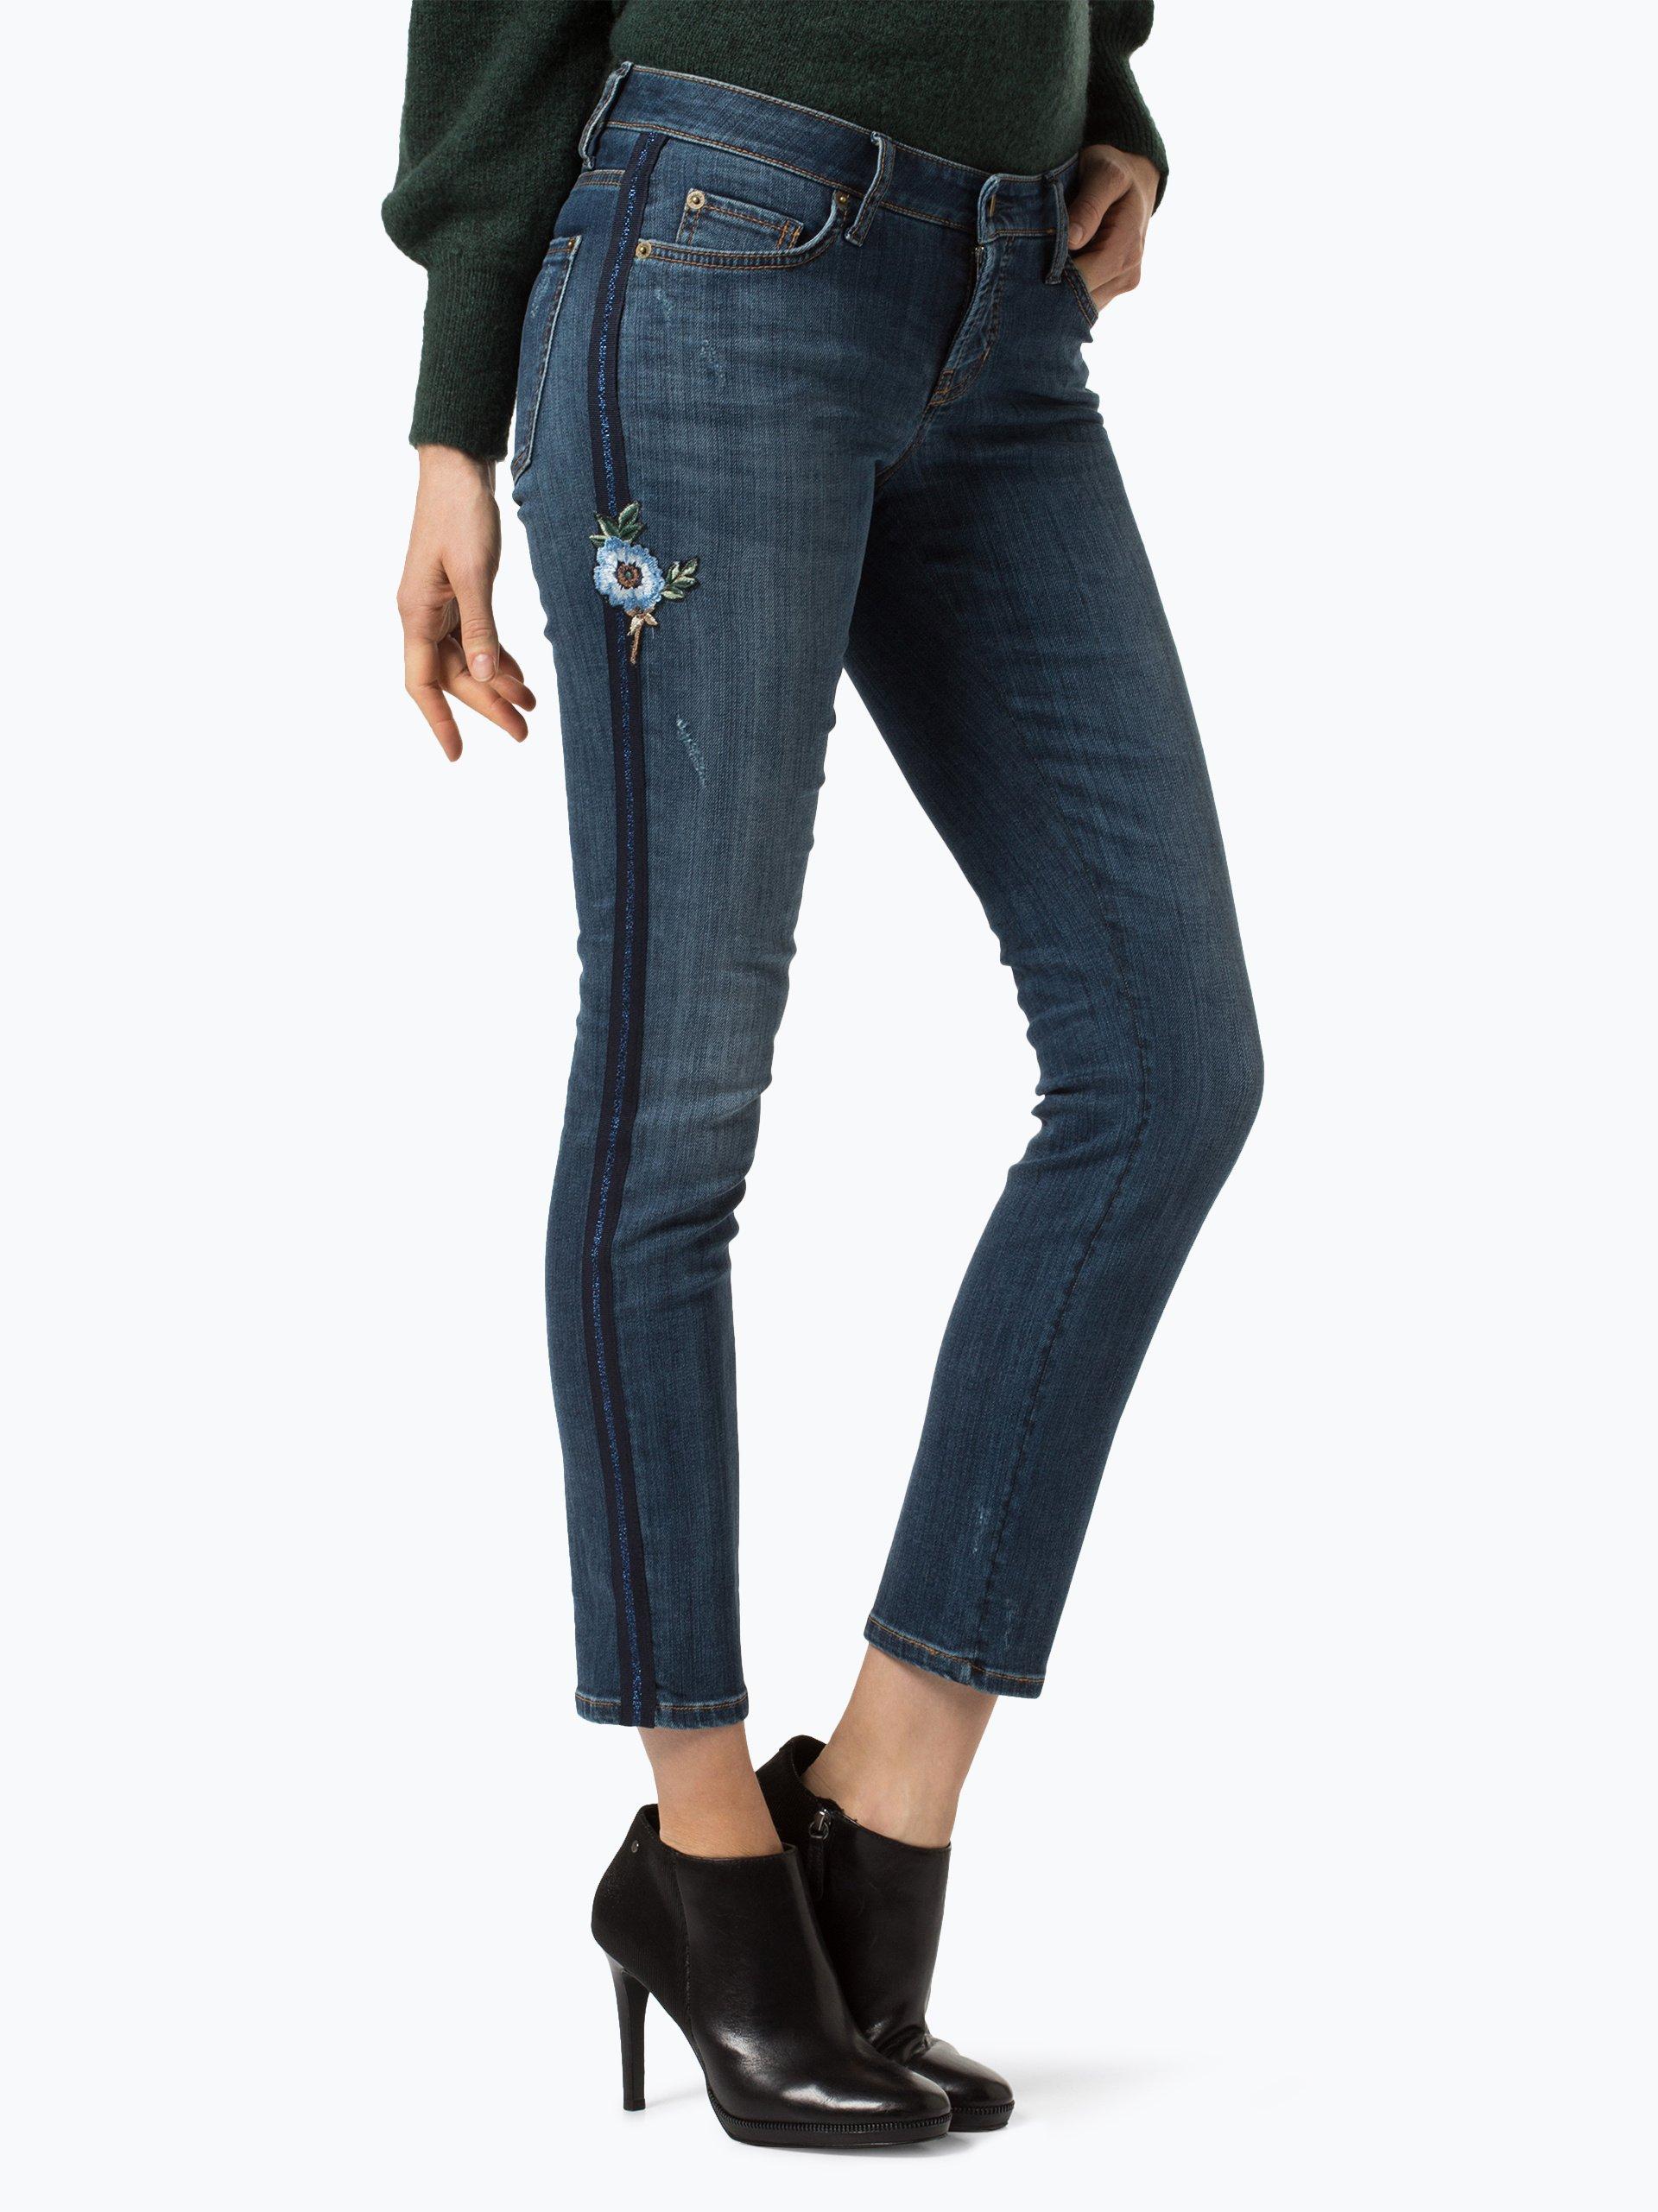 cambio damen jeans liu denim gemustert online kaufen. Black Bedroom Furniture Sets. Home Design Ideas